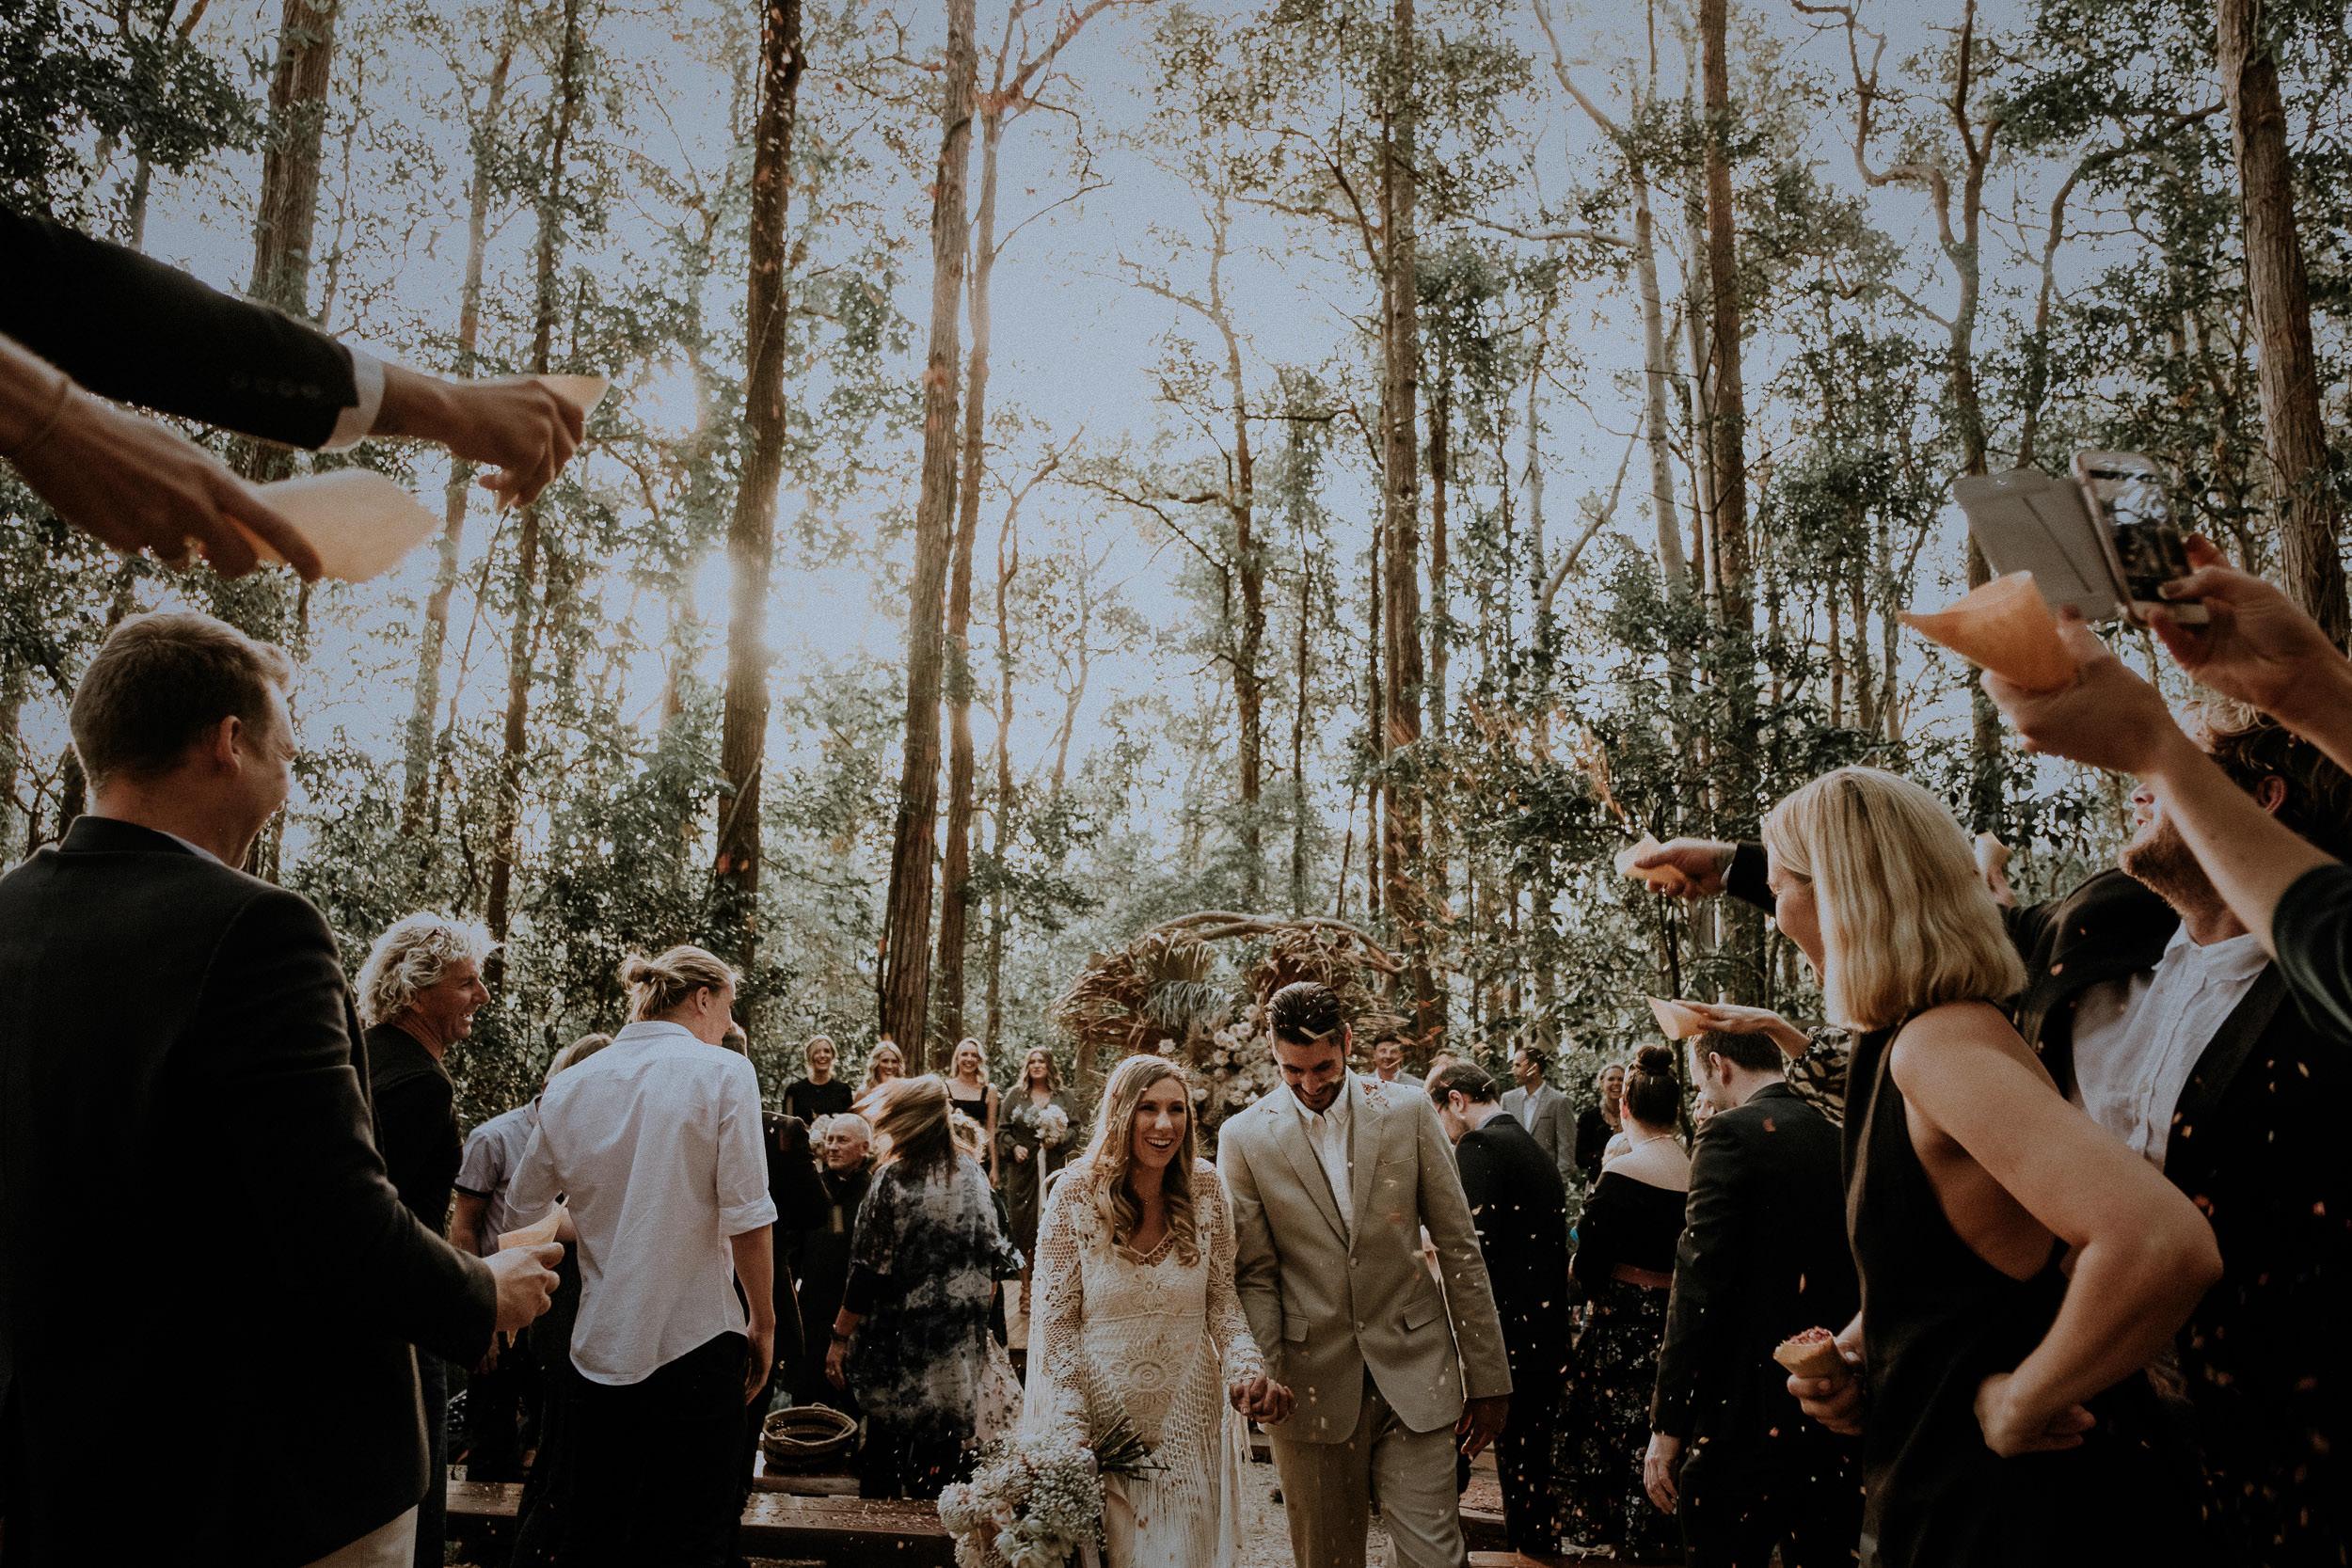 S&A Elopement - Kings & Thieves - Shred 'Til Dead - Central Coast Beach Forest Wedding - 288.jpg